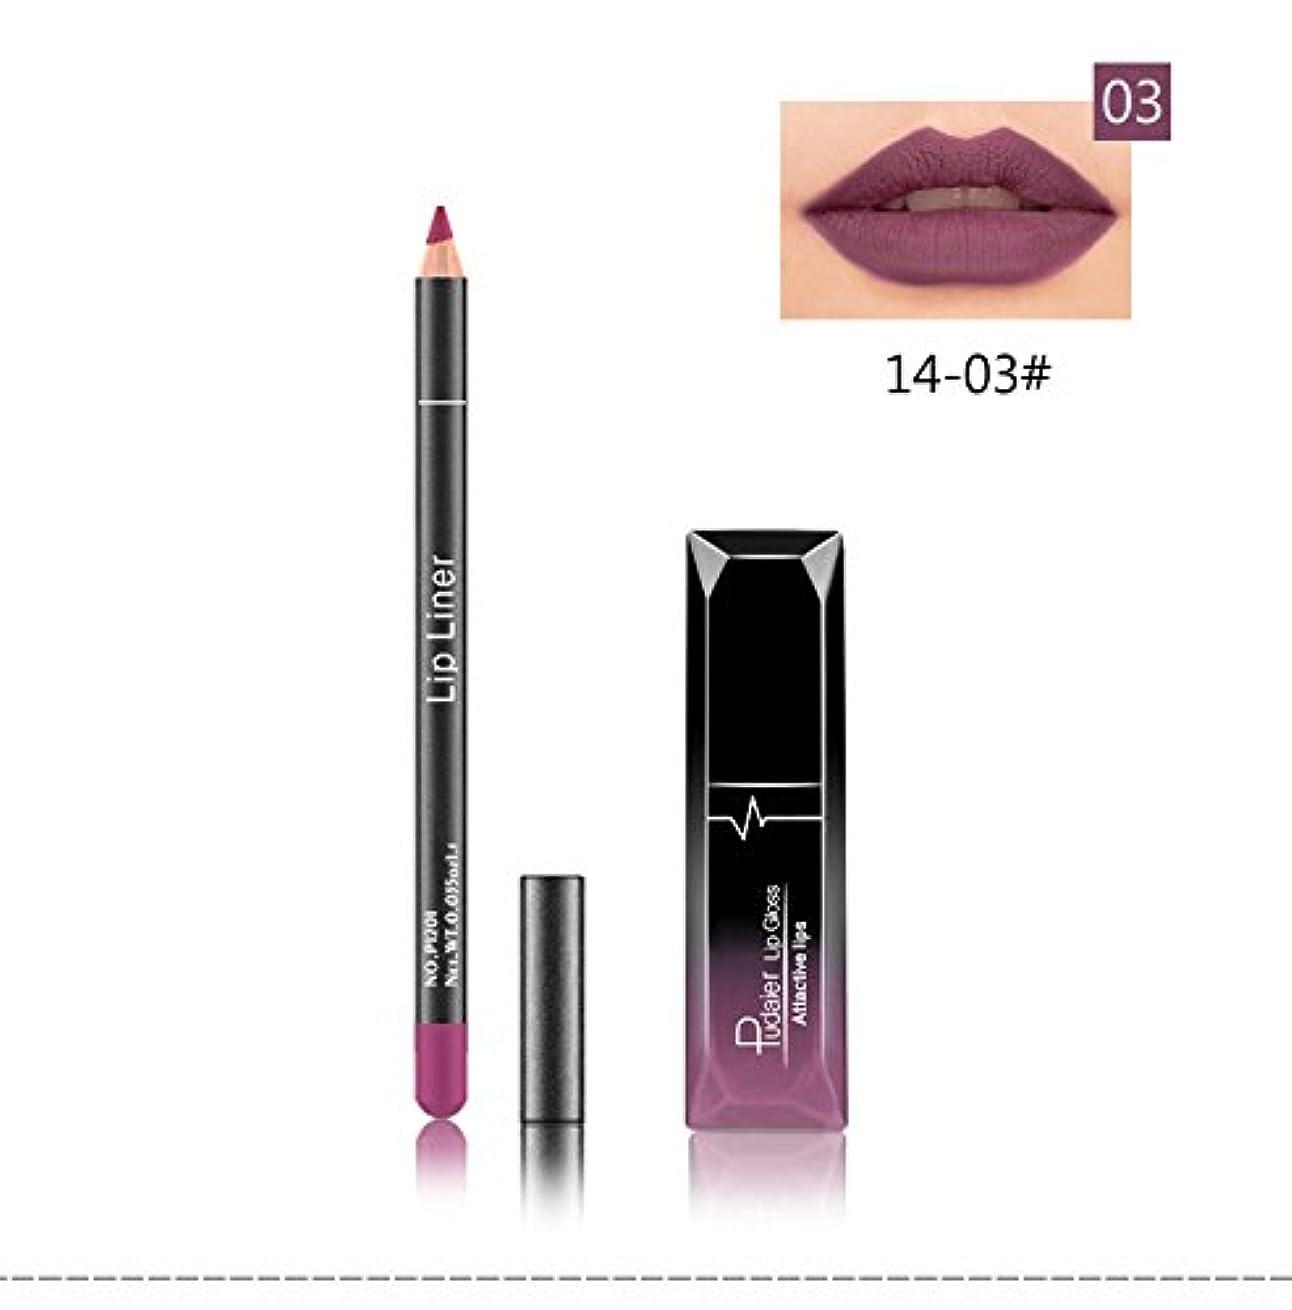 (03) Pudaier 1pc Matte Liquid Lipstick Cosmetic Lip Kit+ 1 Pc Nude Lip Liner Pencil MakeUp Set Waterproof Long...